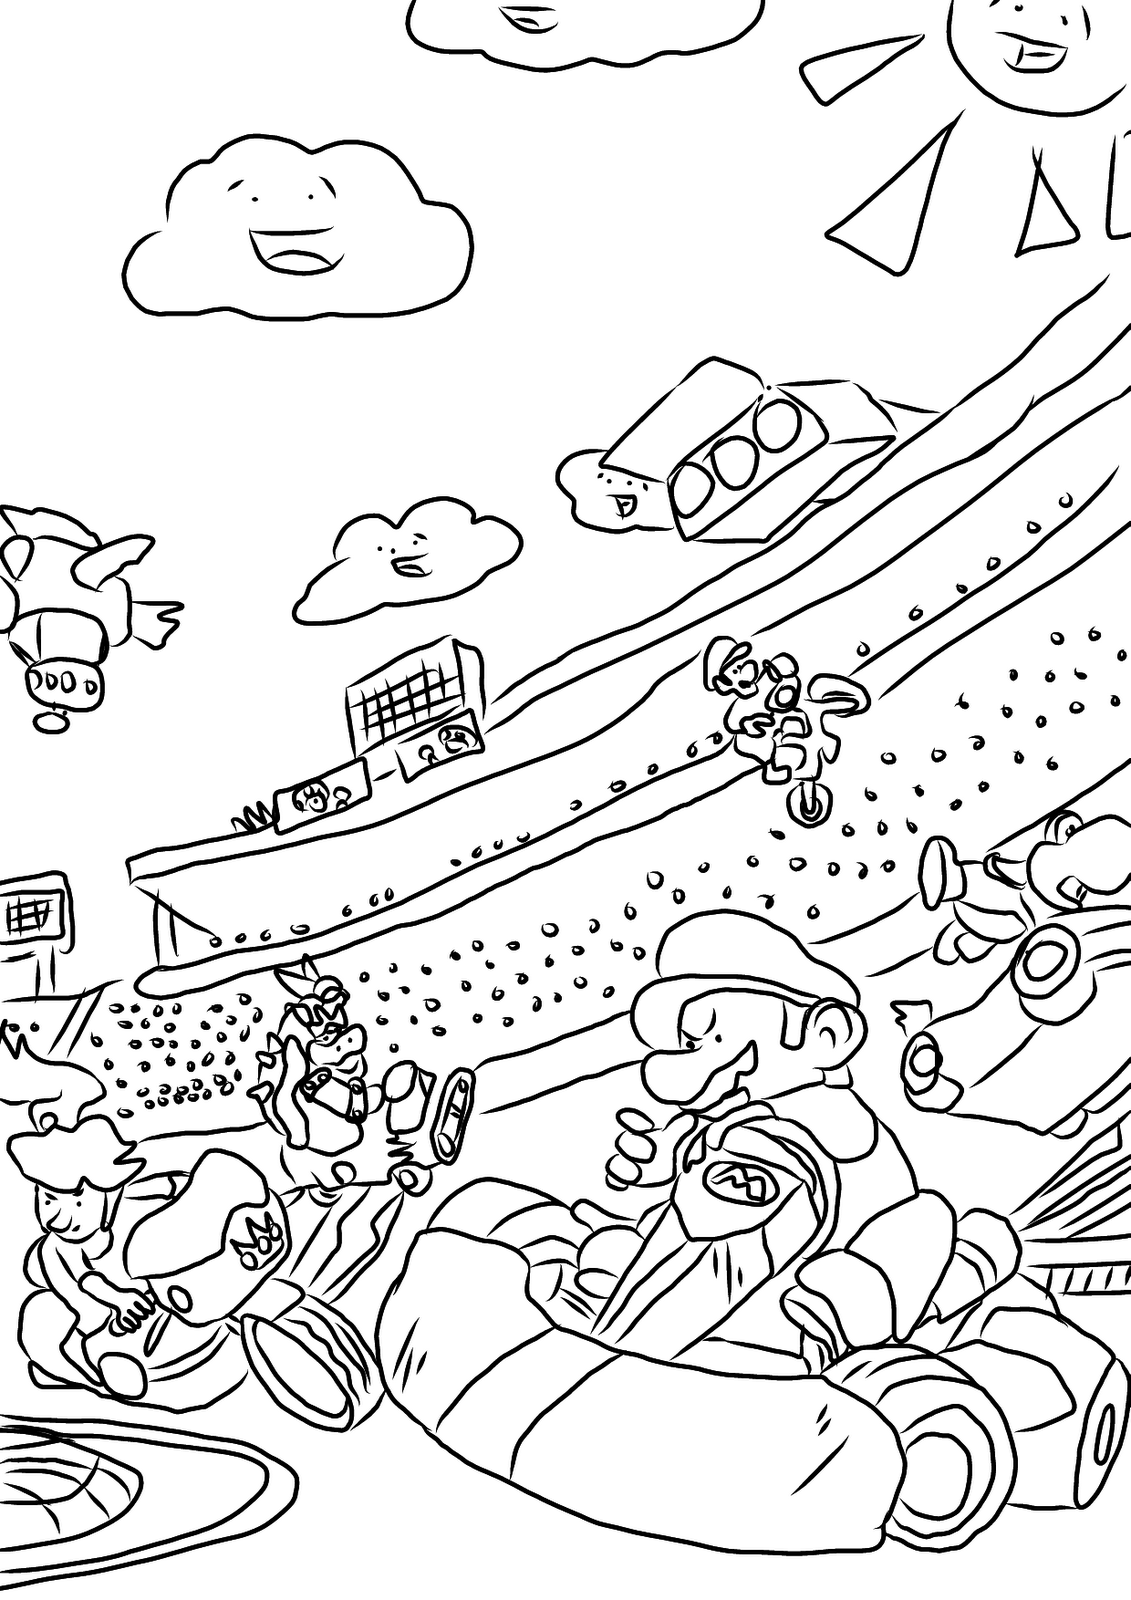 coloring pages mario kart mario kart coloring pages 29233 bestofcoloringcom coloring kart pages mario